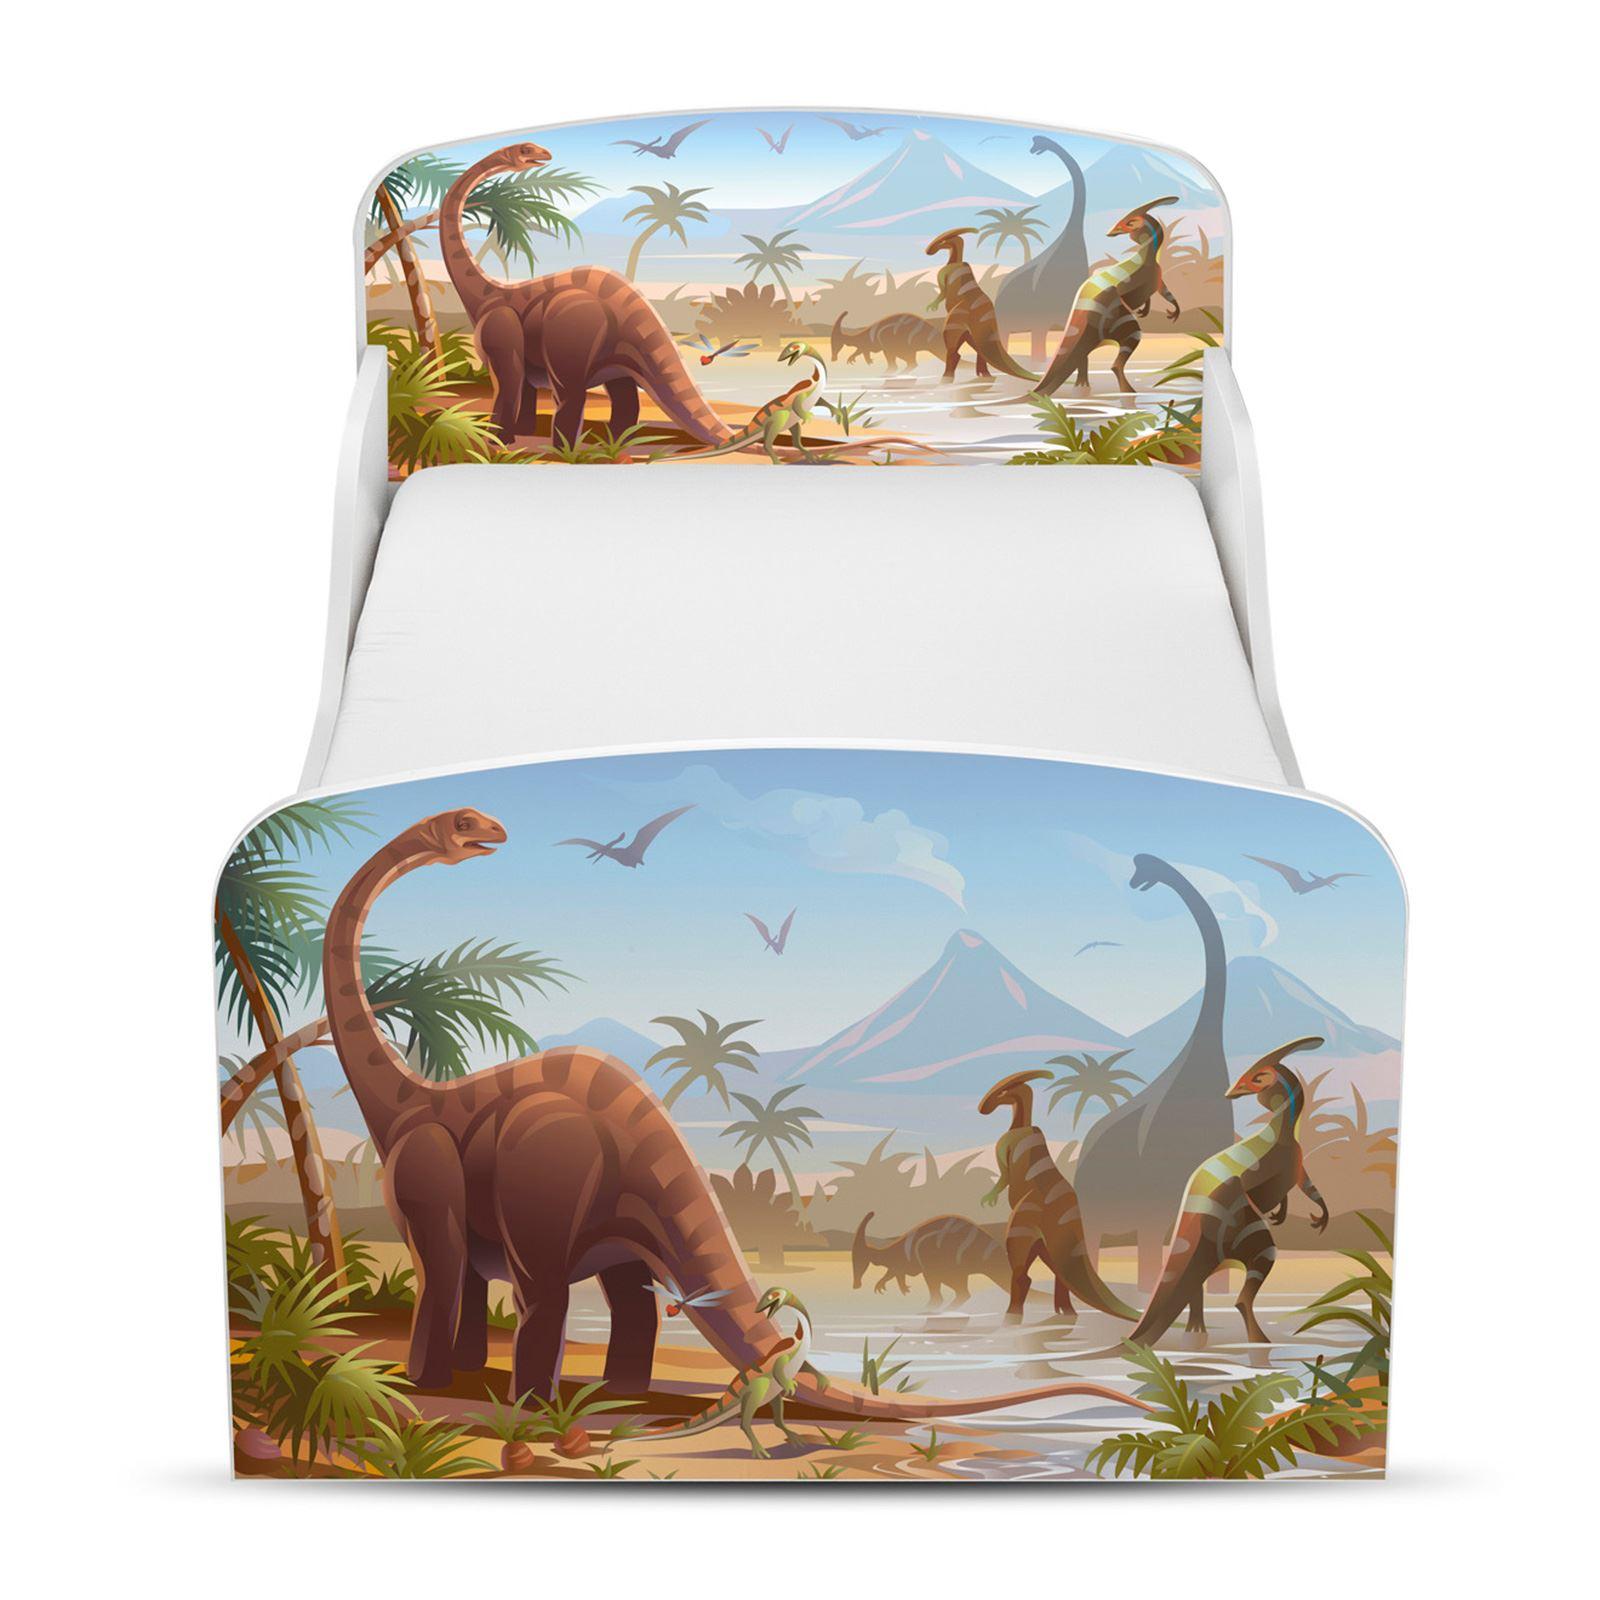 Price-Right-Home-Jurasico-Dinosaurios-Cama-Infantil-Colchon-Opciones-Nuevo miniatura 4